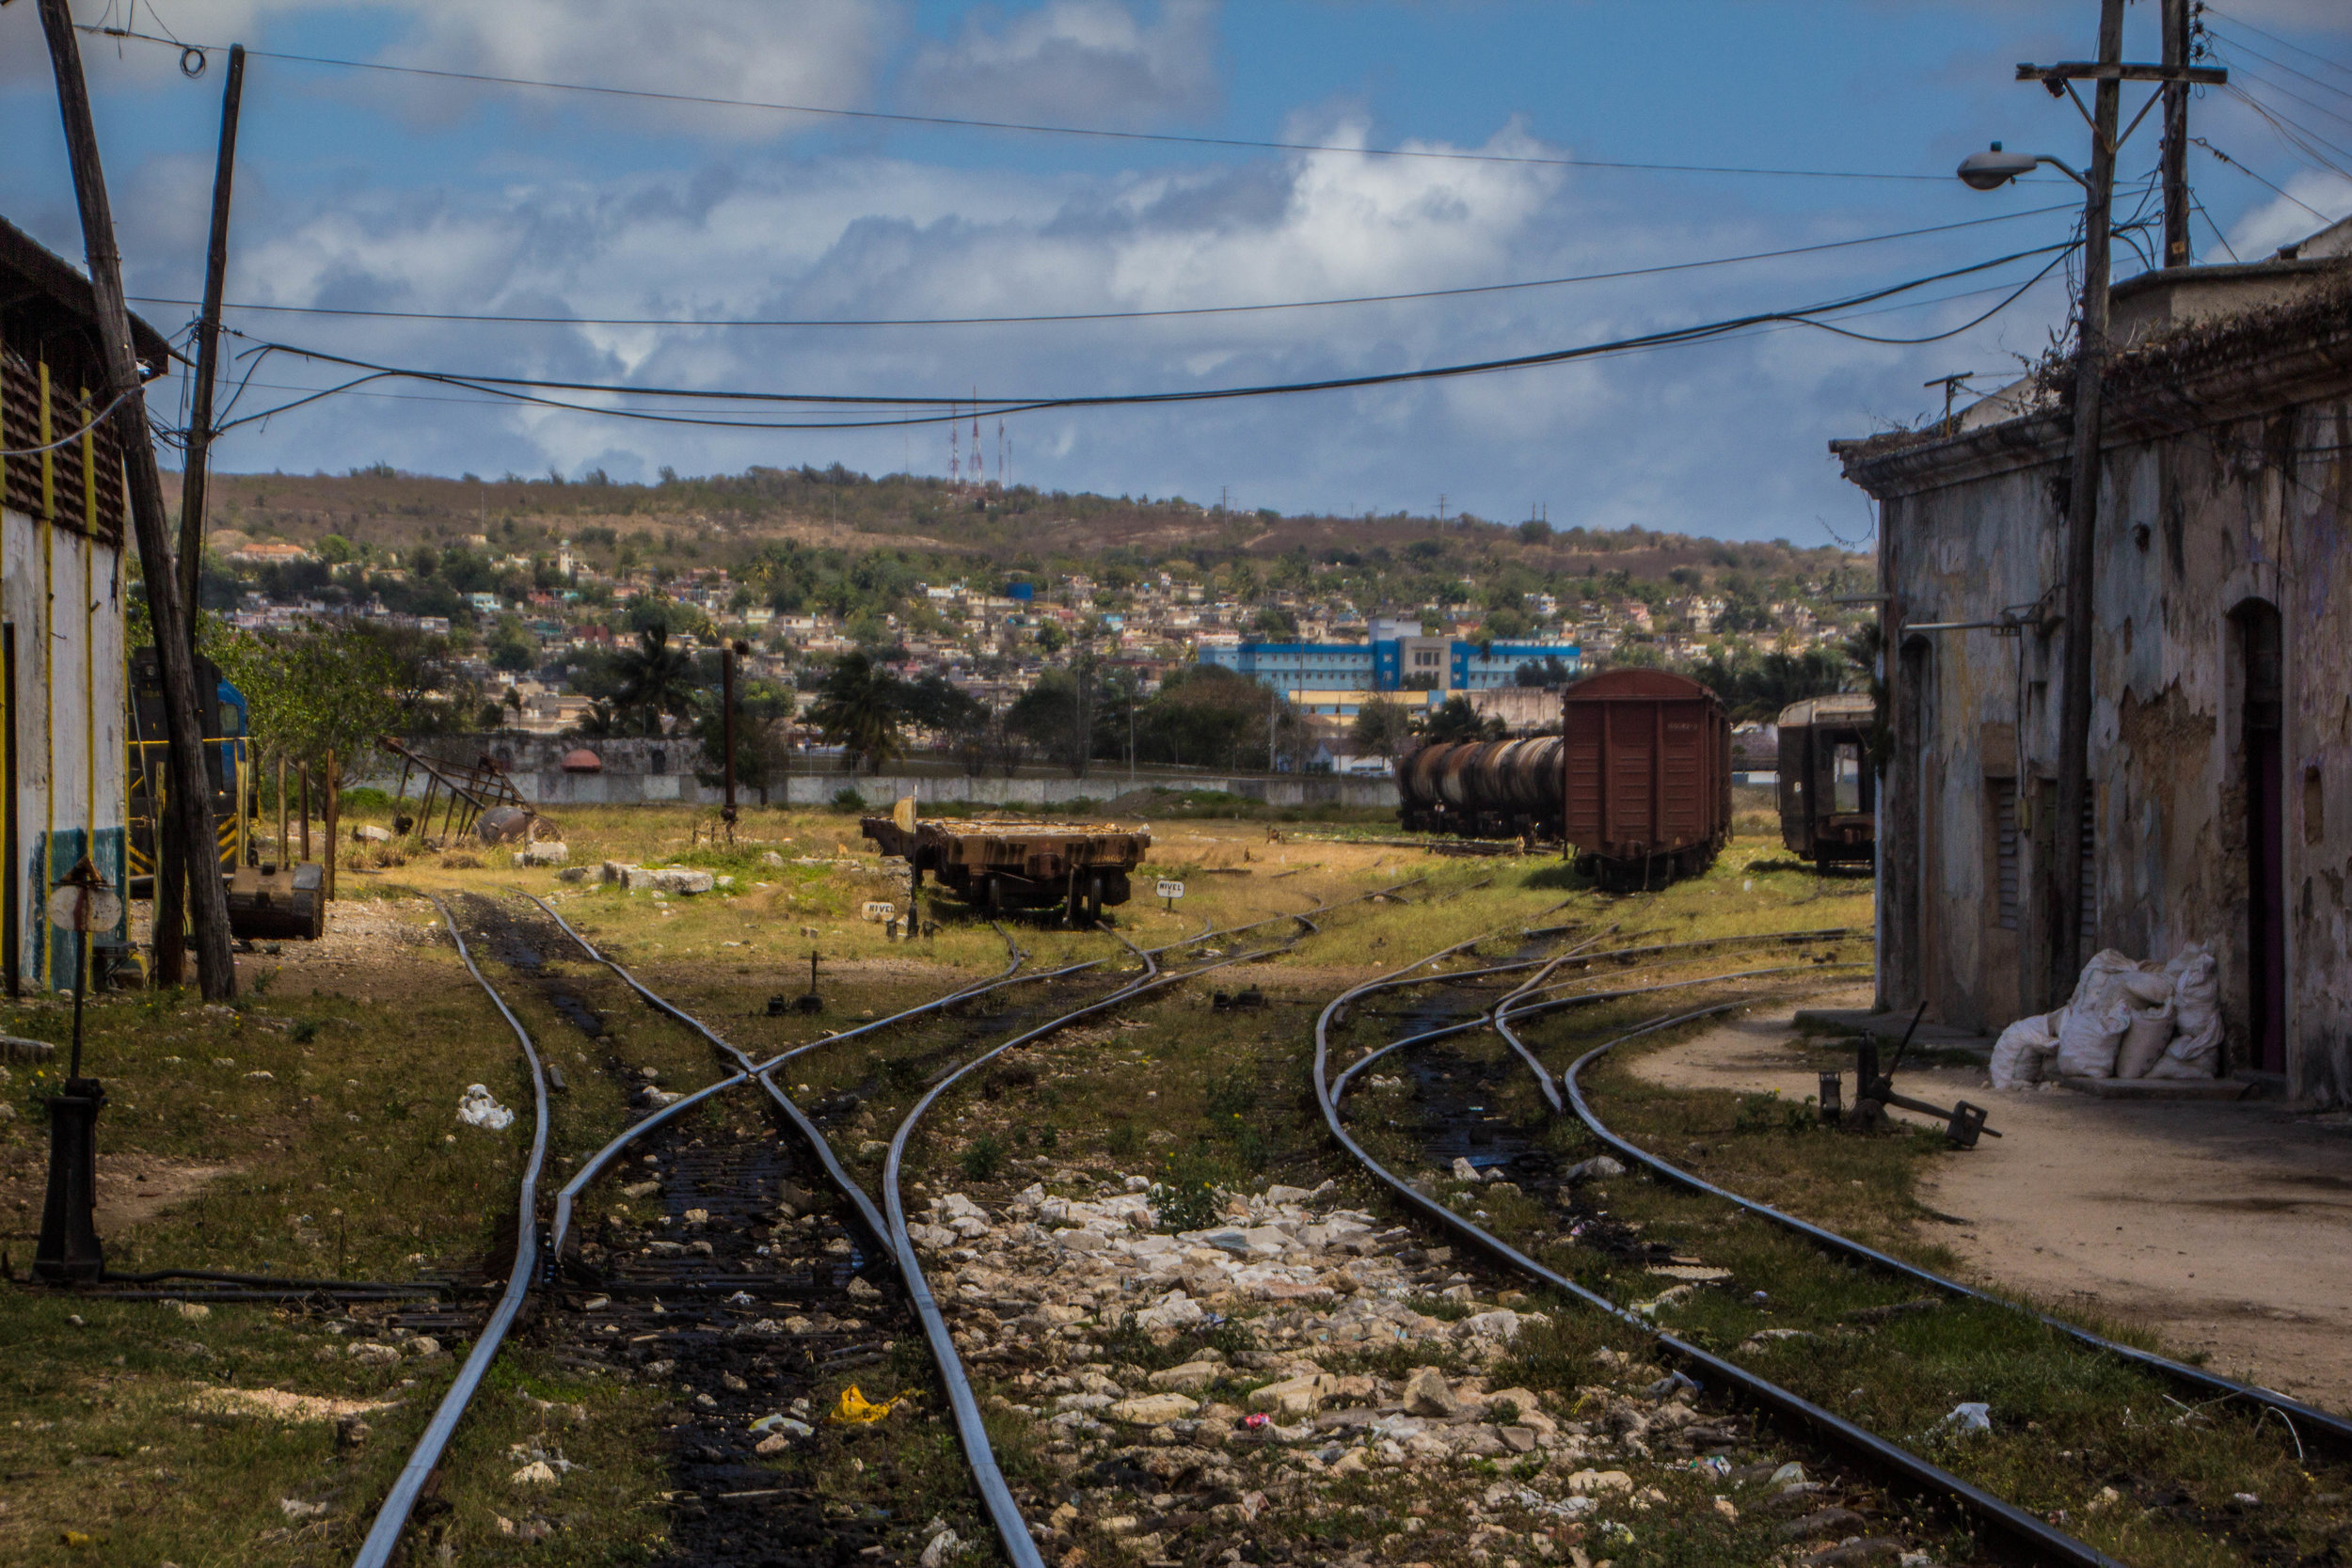 train tracks matanzas cuba-1-2.jpg